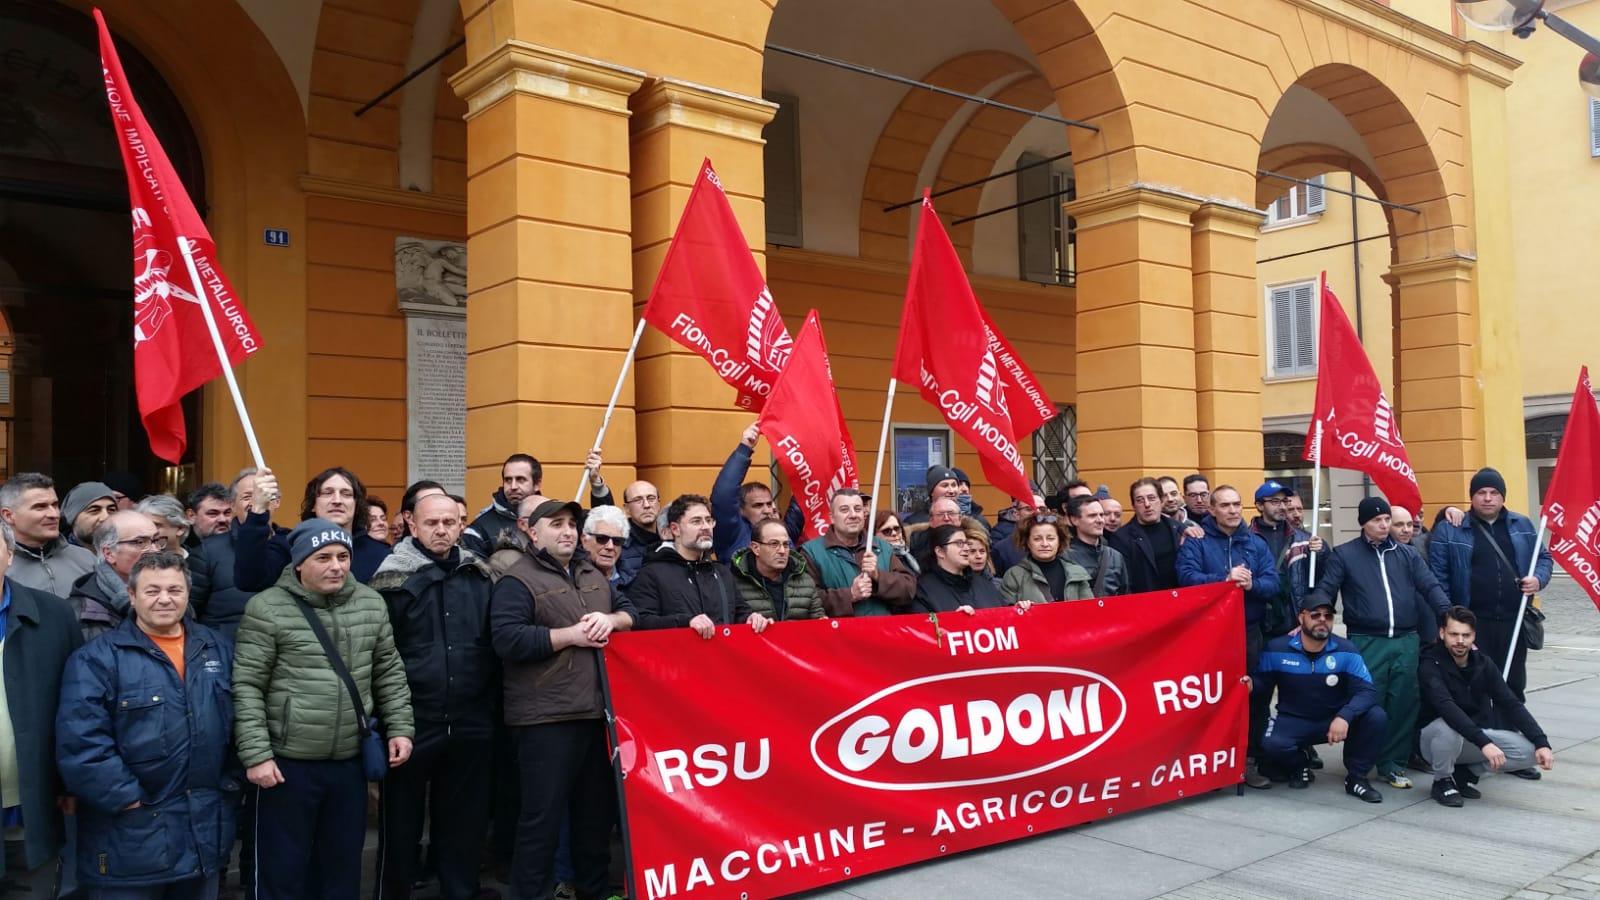 goldoni arbos presidio Municipio Carpi 17.2.20